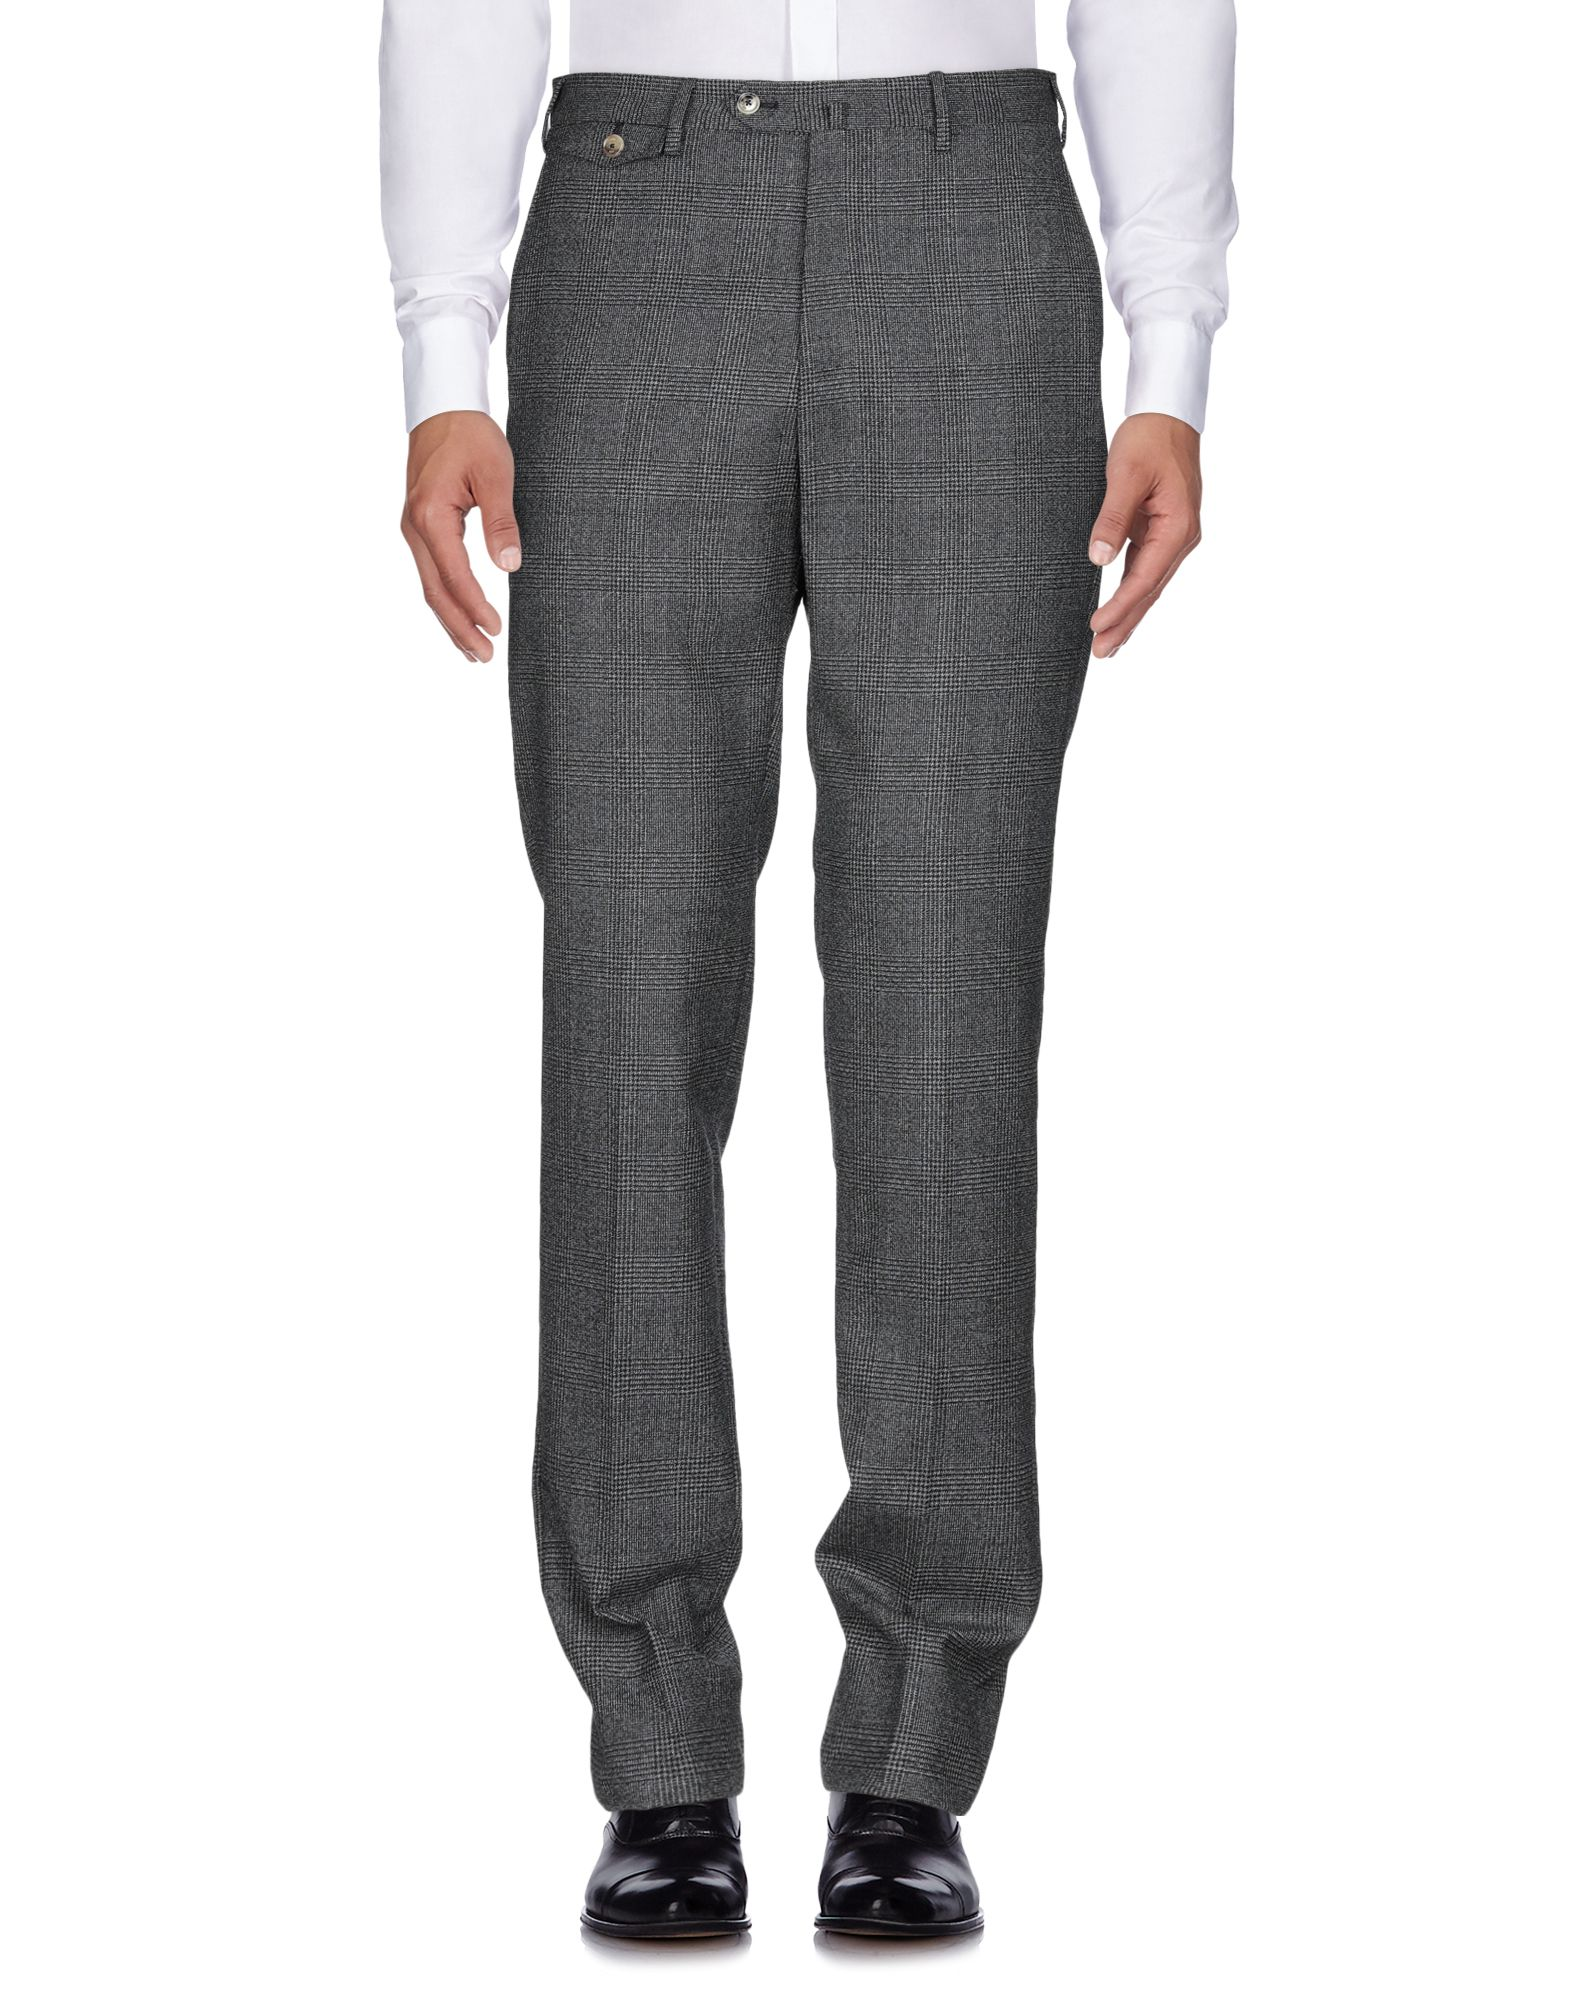 Pantalone Pantalone Pt01 uomo - 13210671AJ  Online-Rabatt